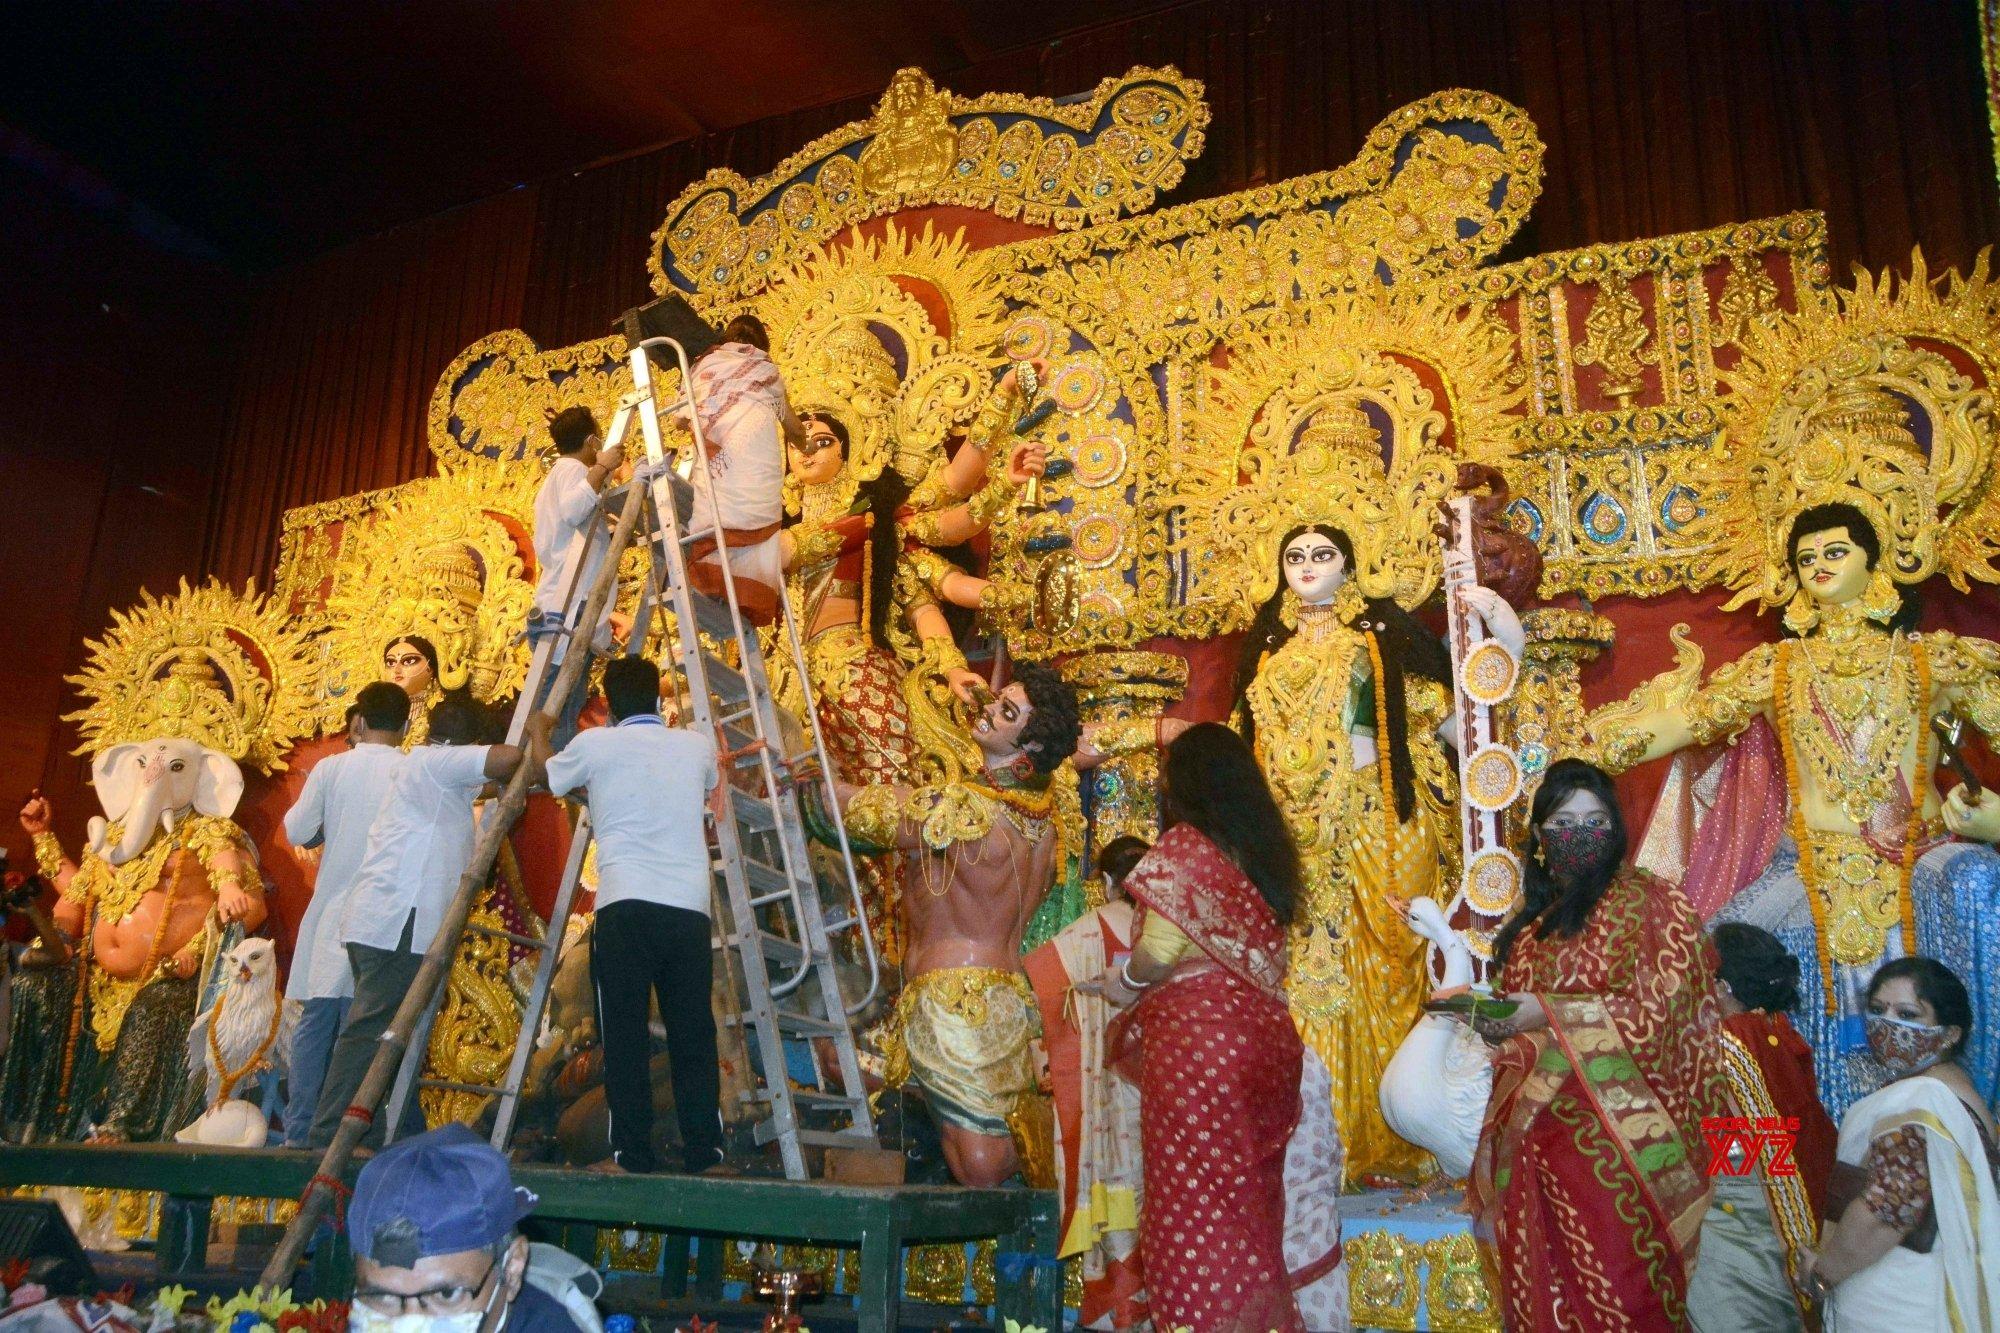 Kolkata: Women perform rituals ahead of Durga idol immersion at Ekdalia Evergreen Club community puja pandal #Gallery